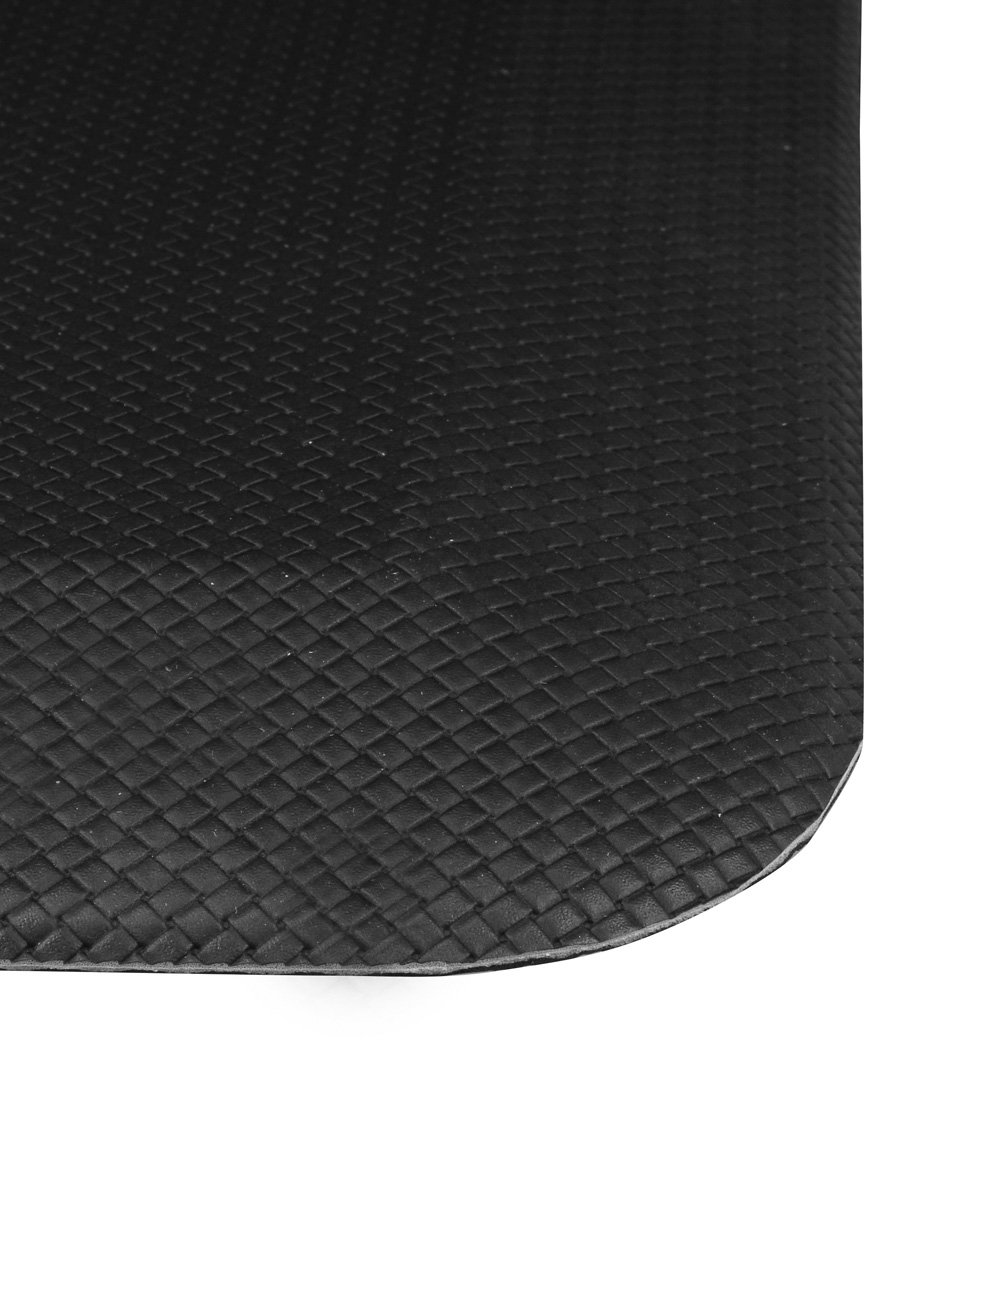 Industrial Kitchen Floor Mats Amazoncom Sky Mat Anti Fatigue Mat 20 In X 39 In Black